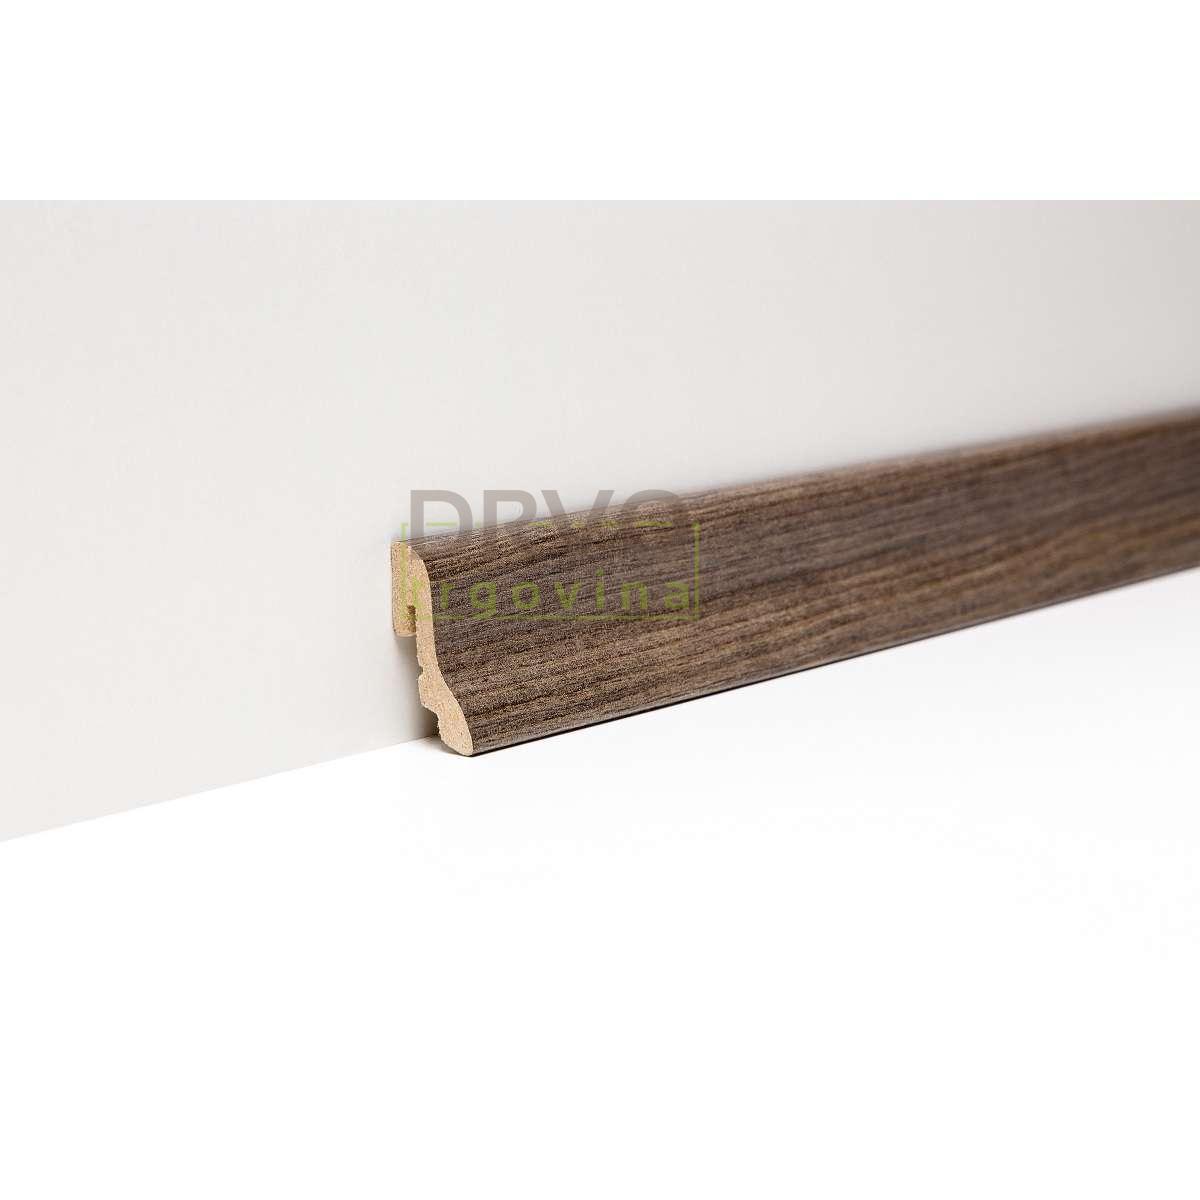 LETVICA ZA LAMINAT 38,5mm FOEI605  FU18L 3793/3749/K399 2,4m